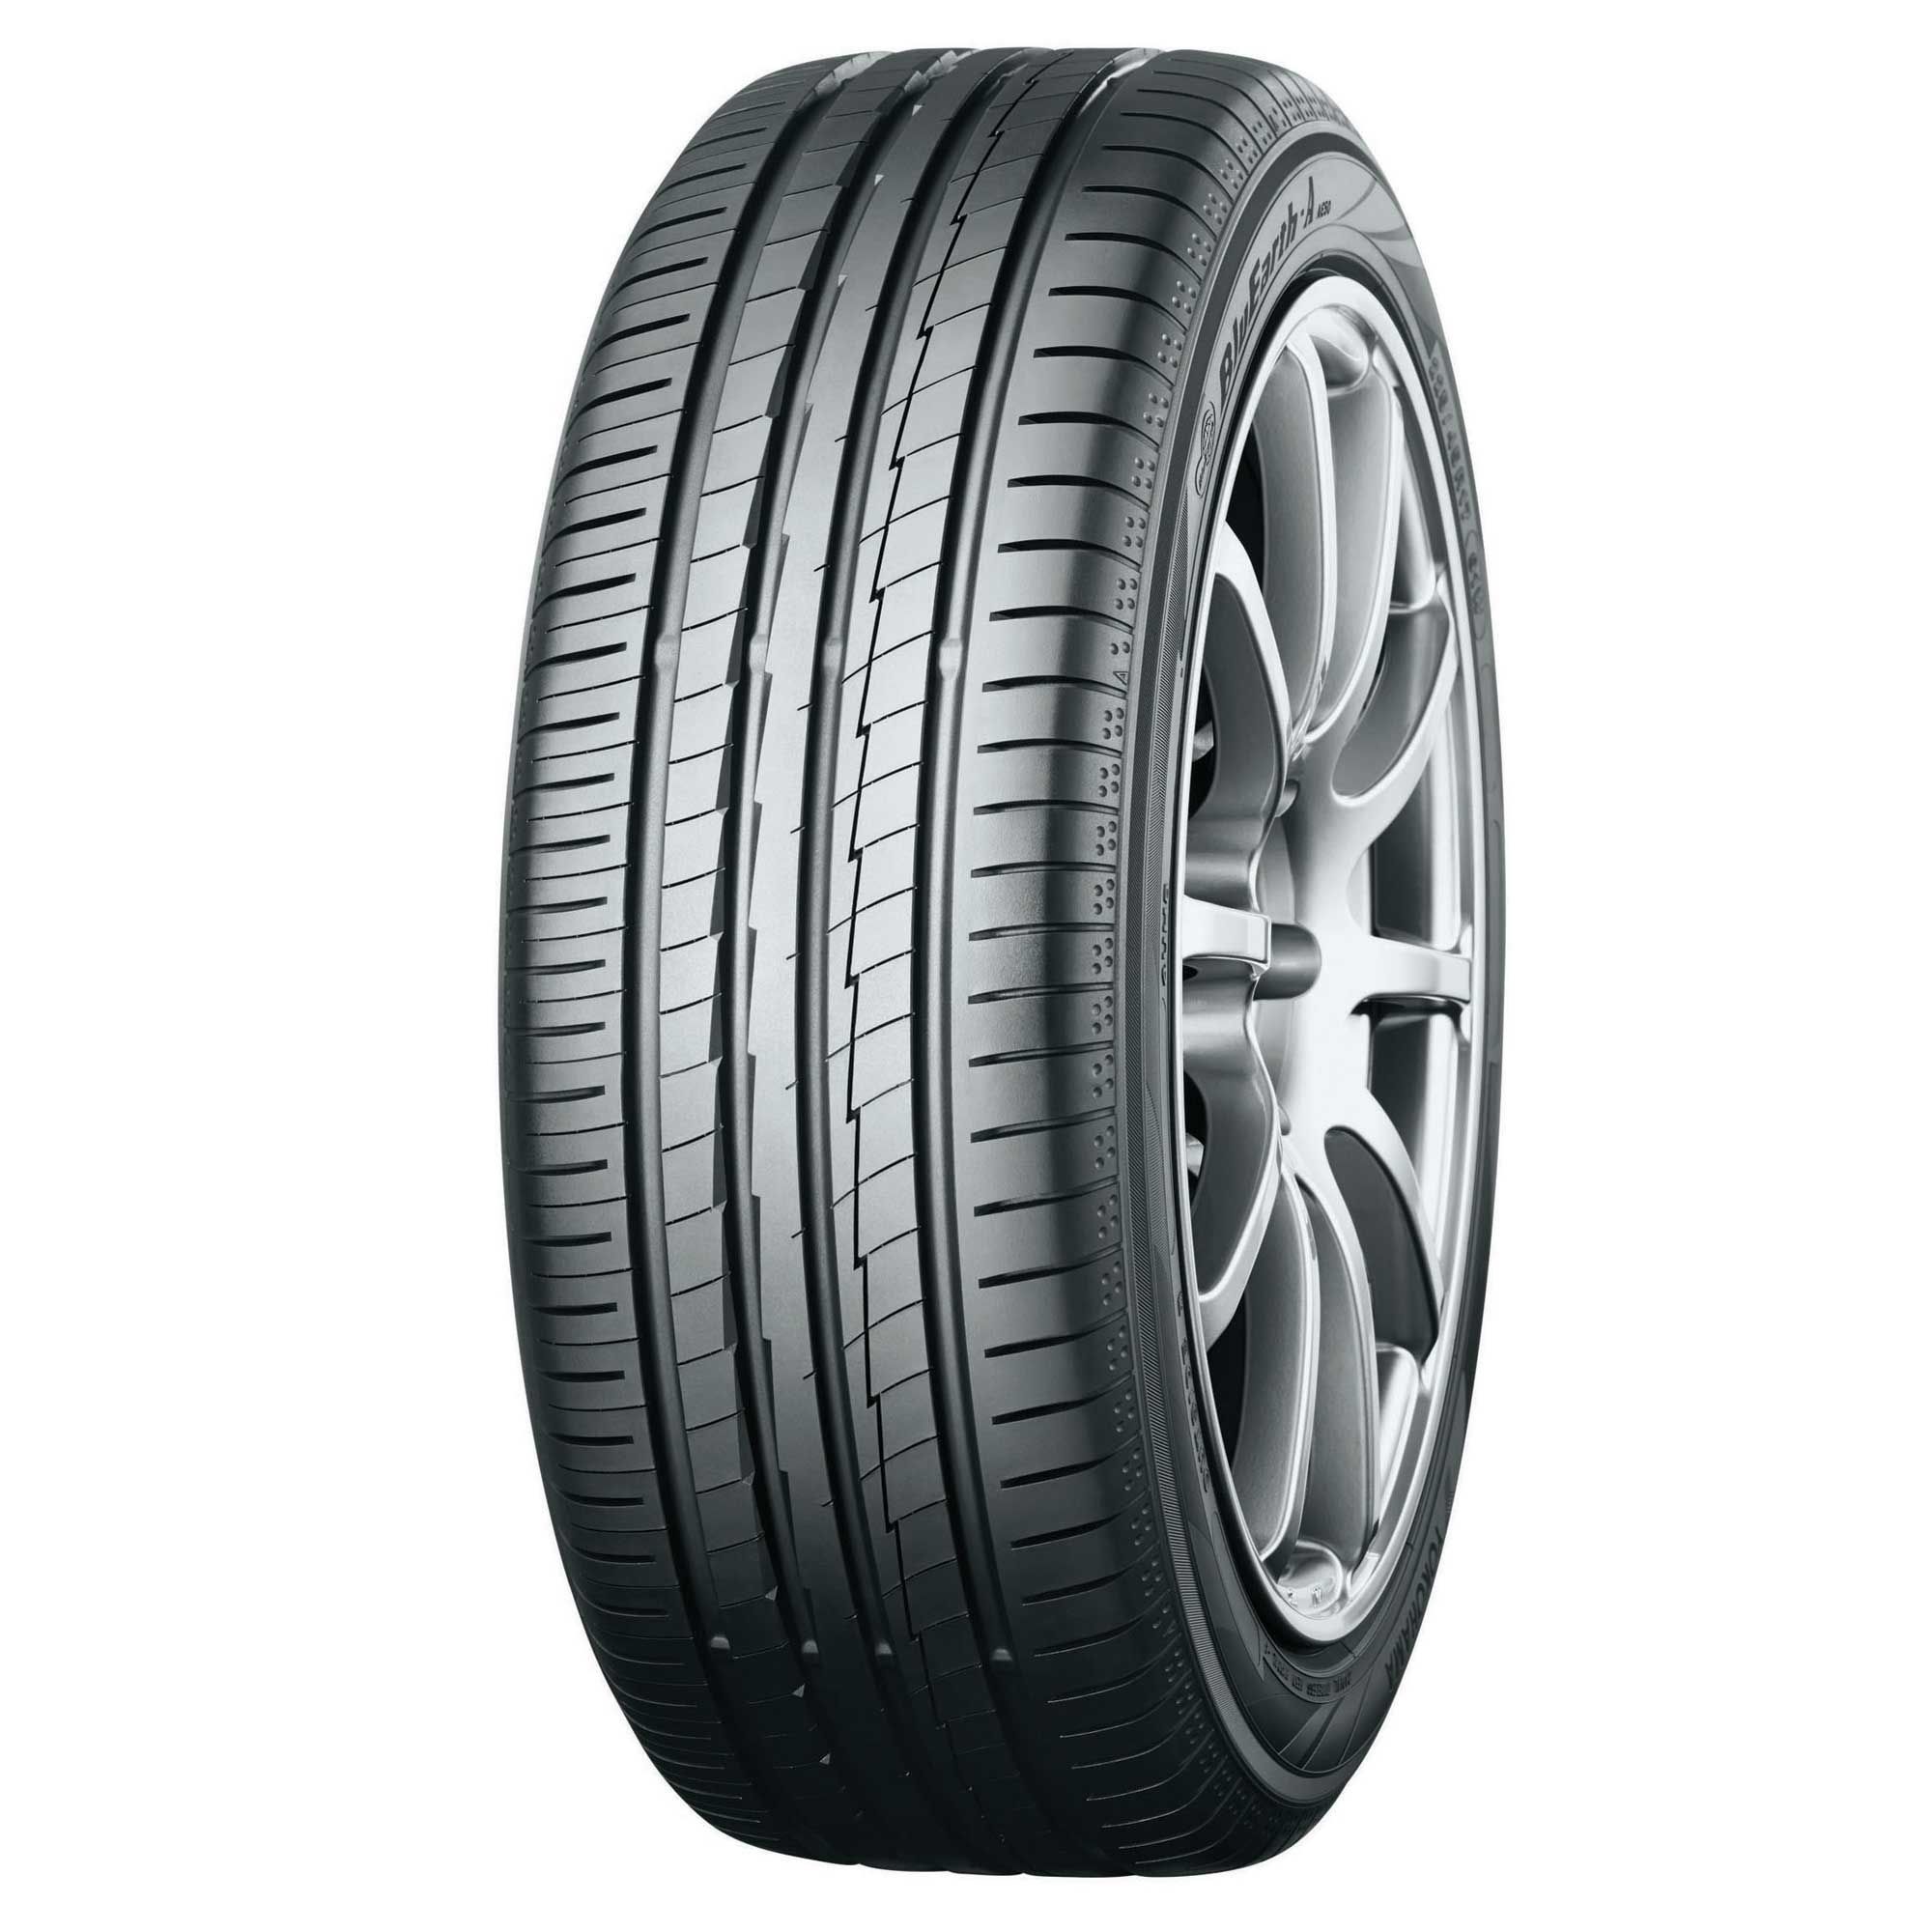 Tyre size 1956015 — Premier Tyres